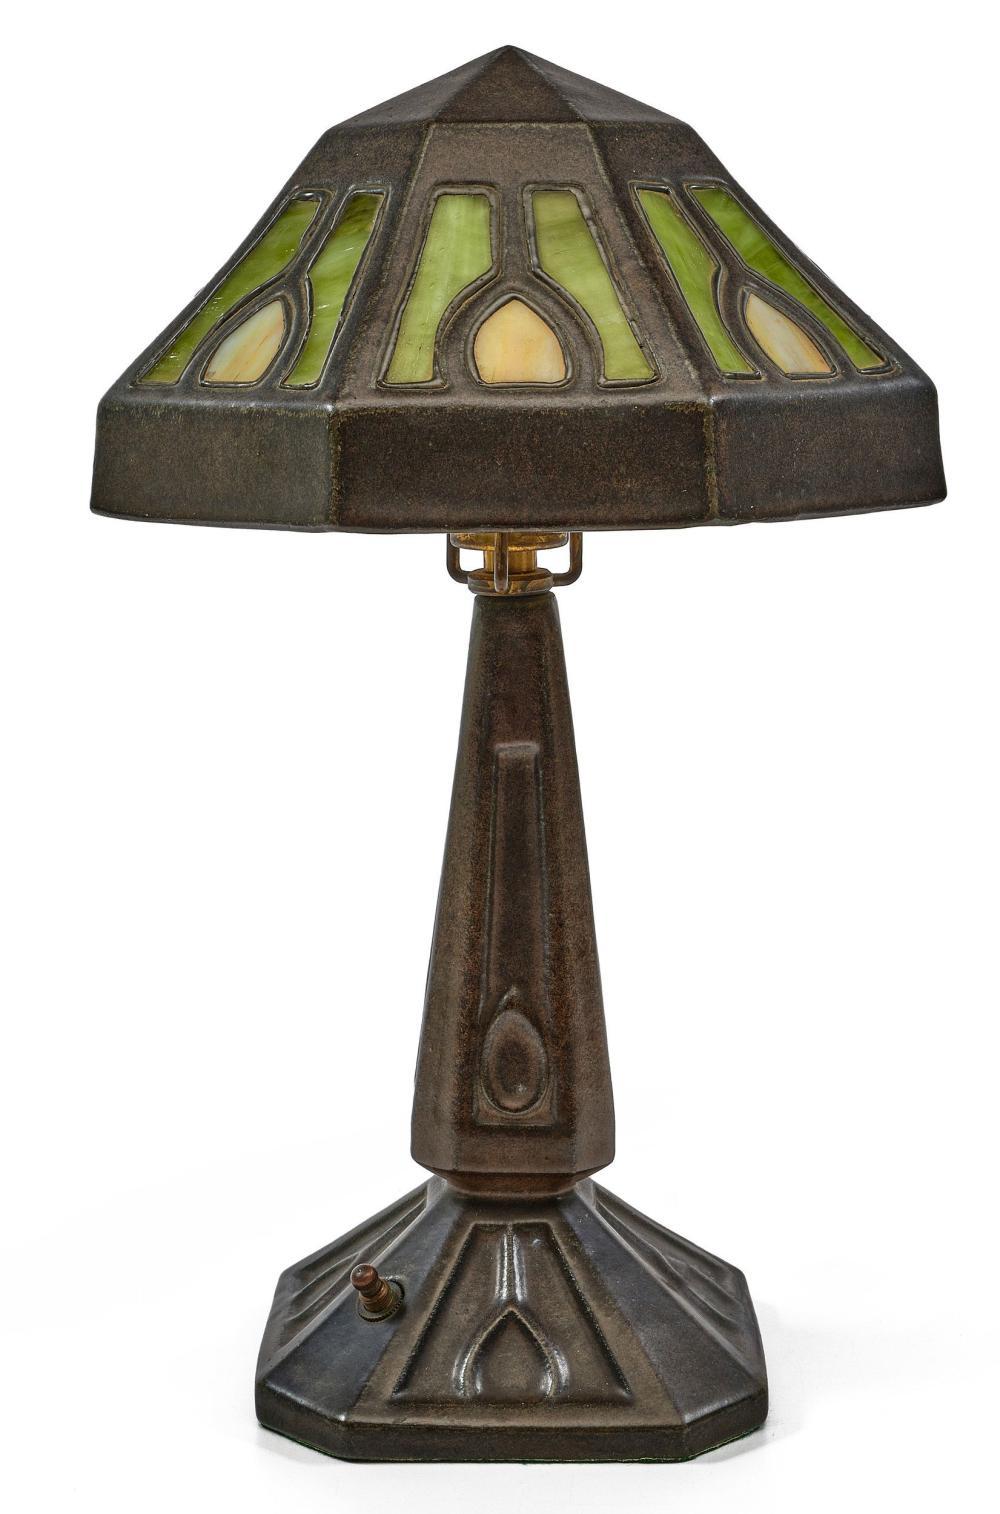 Fulper lamp